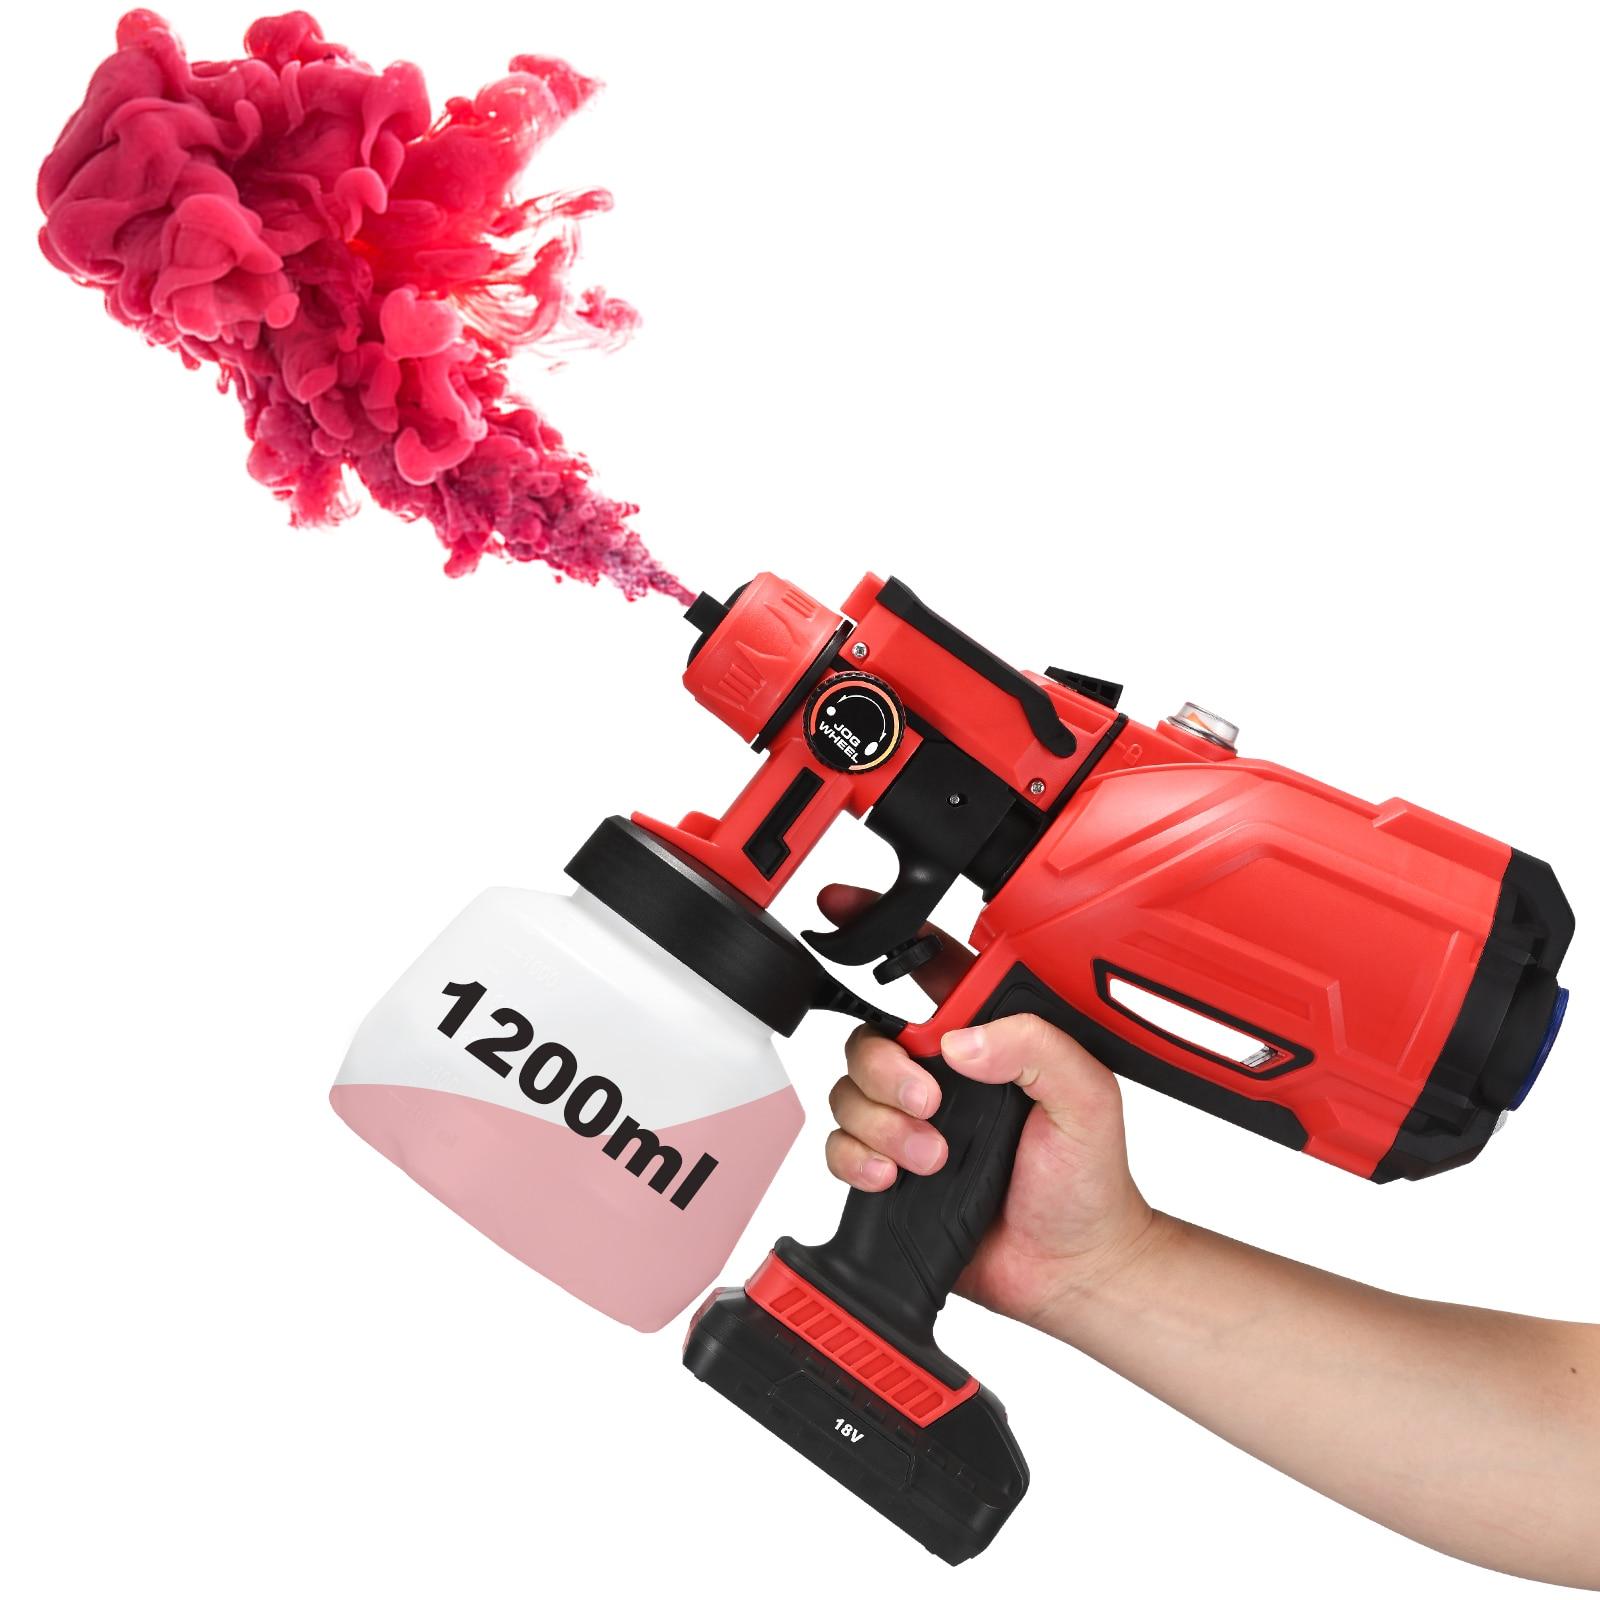 Electric Spray Gun 3 Spraying Modes 1200ml HVLP Household Paint Sprayer Flow Control Airbrush Portable Electric Paint Sprayer